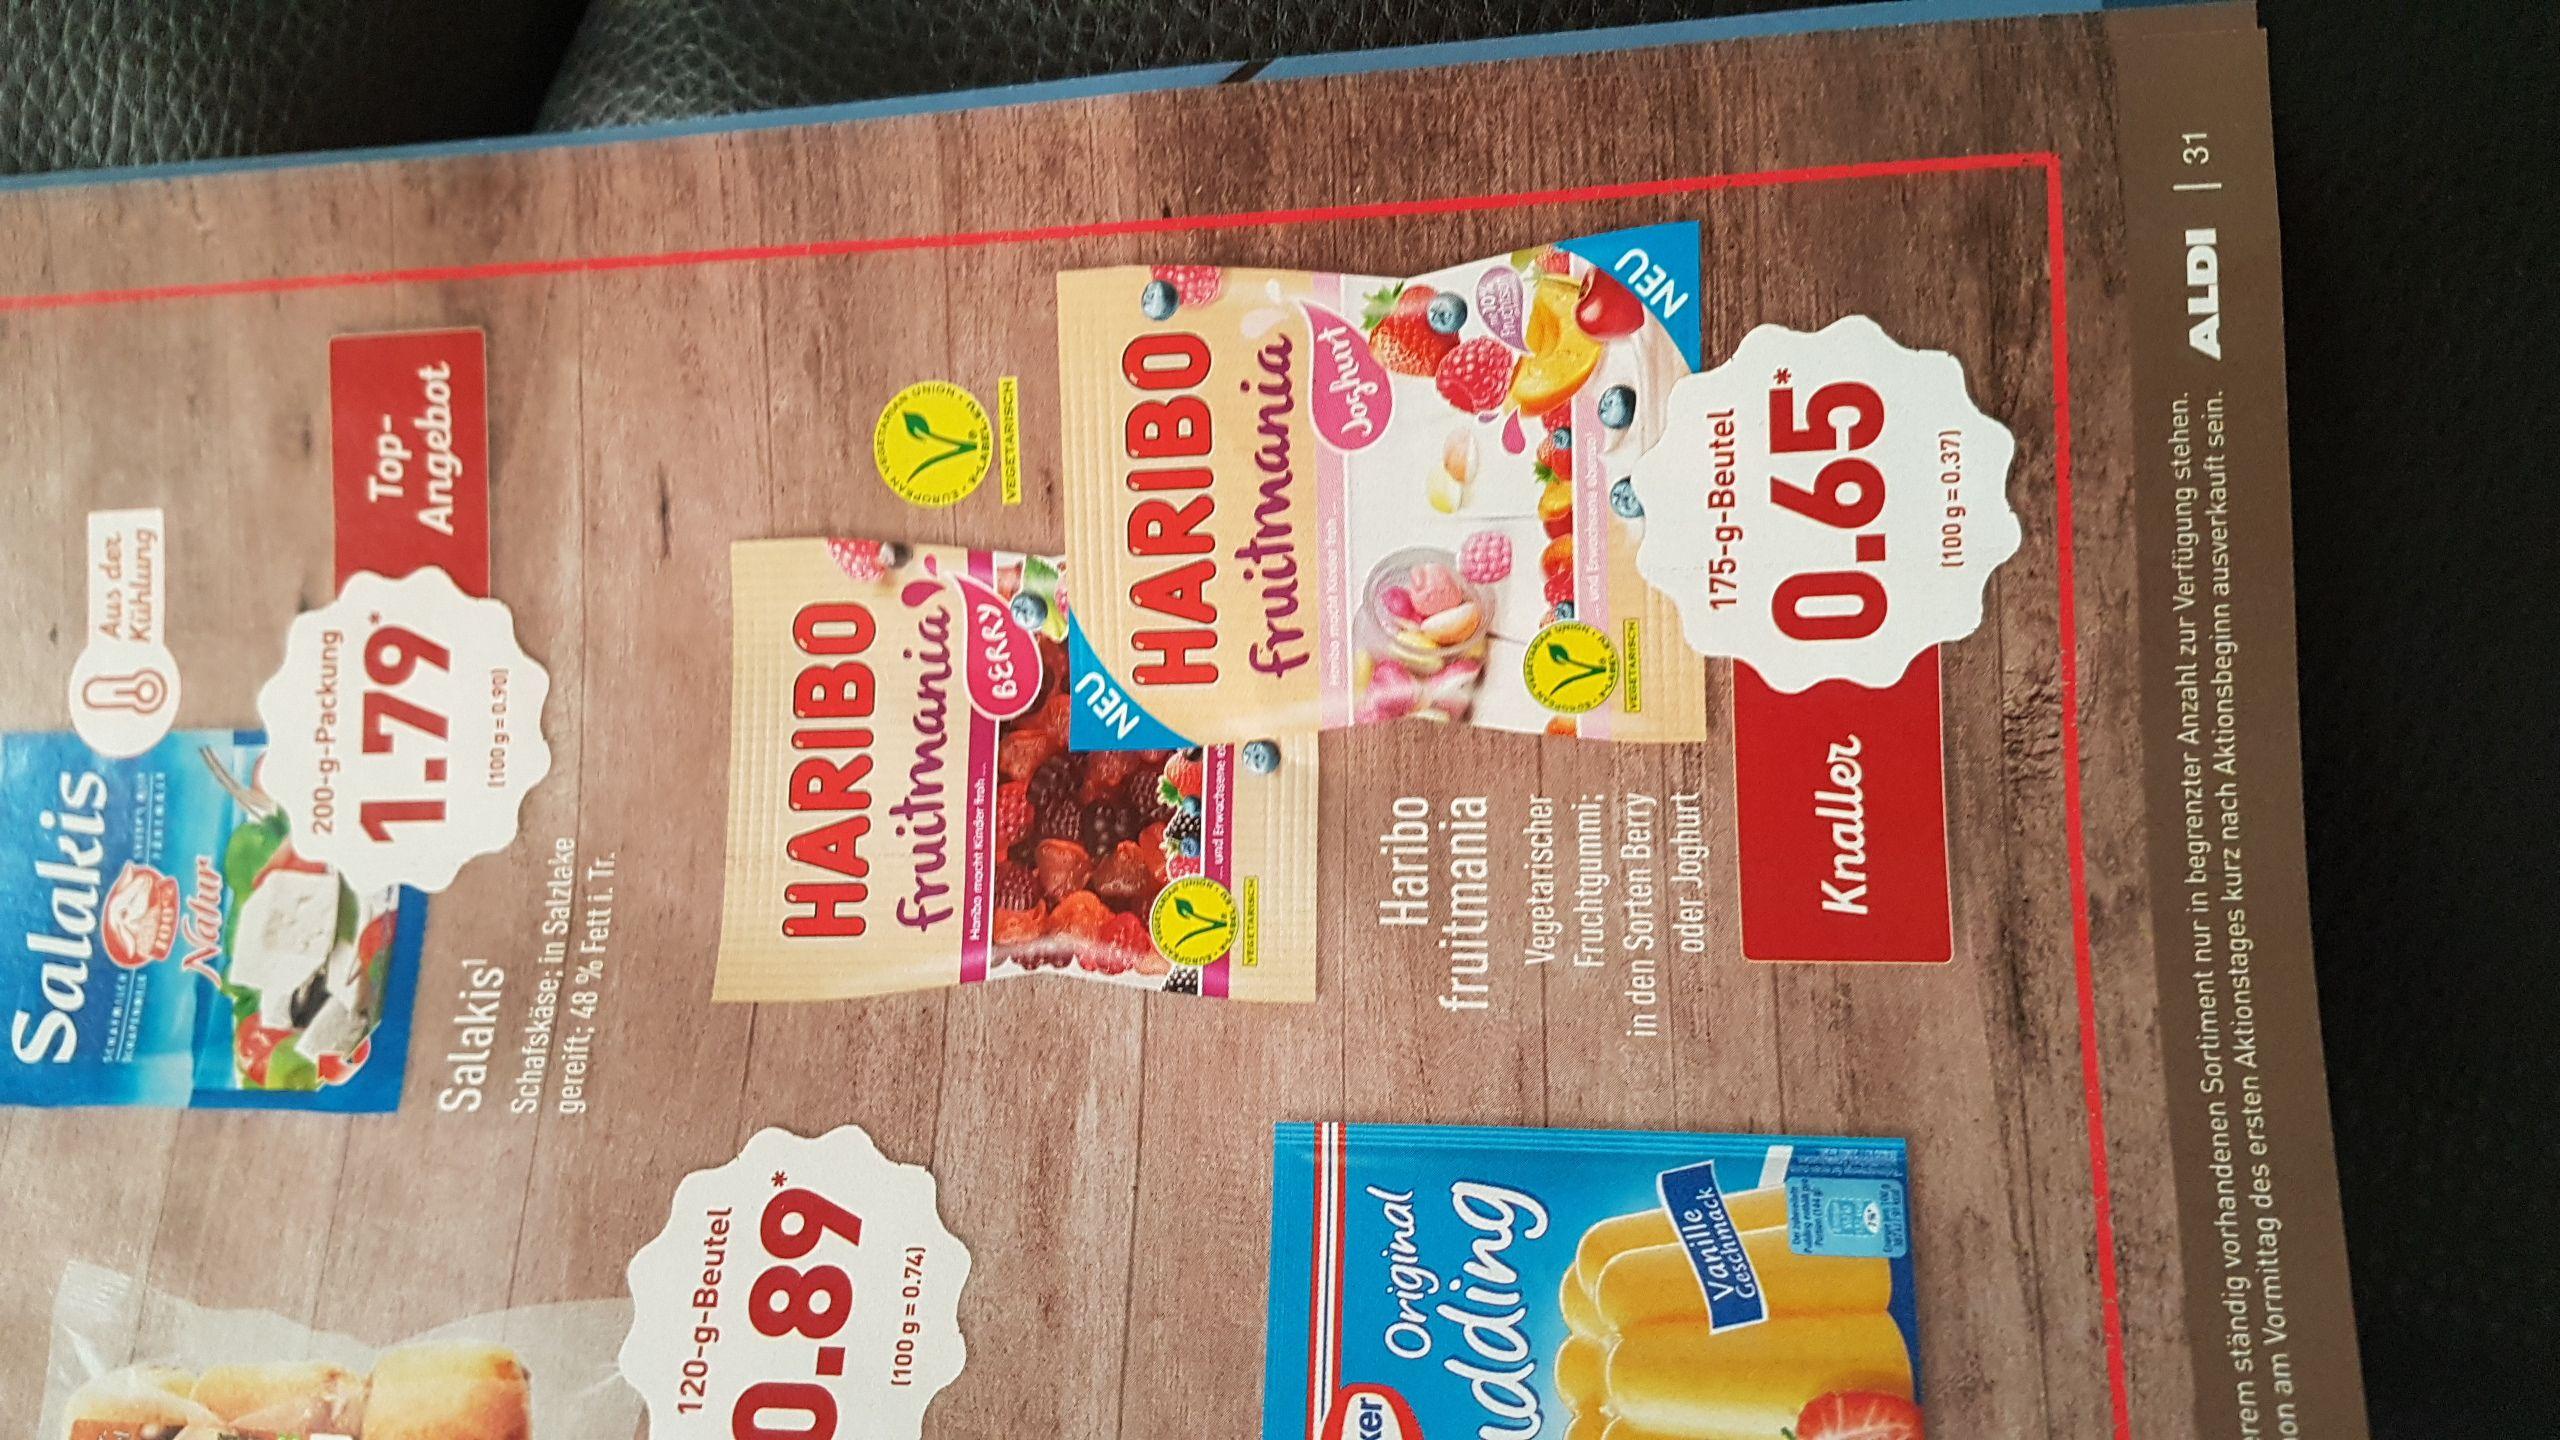 Haribo Fruitmania 30 cent Cashback + 0,50 cent Cashback auf Aldi Kassenzettel = Freebie